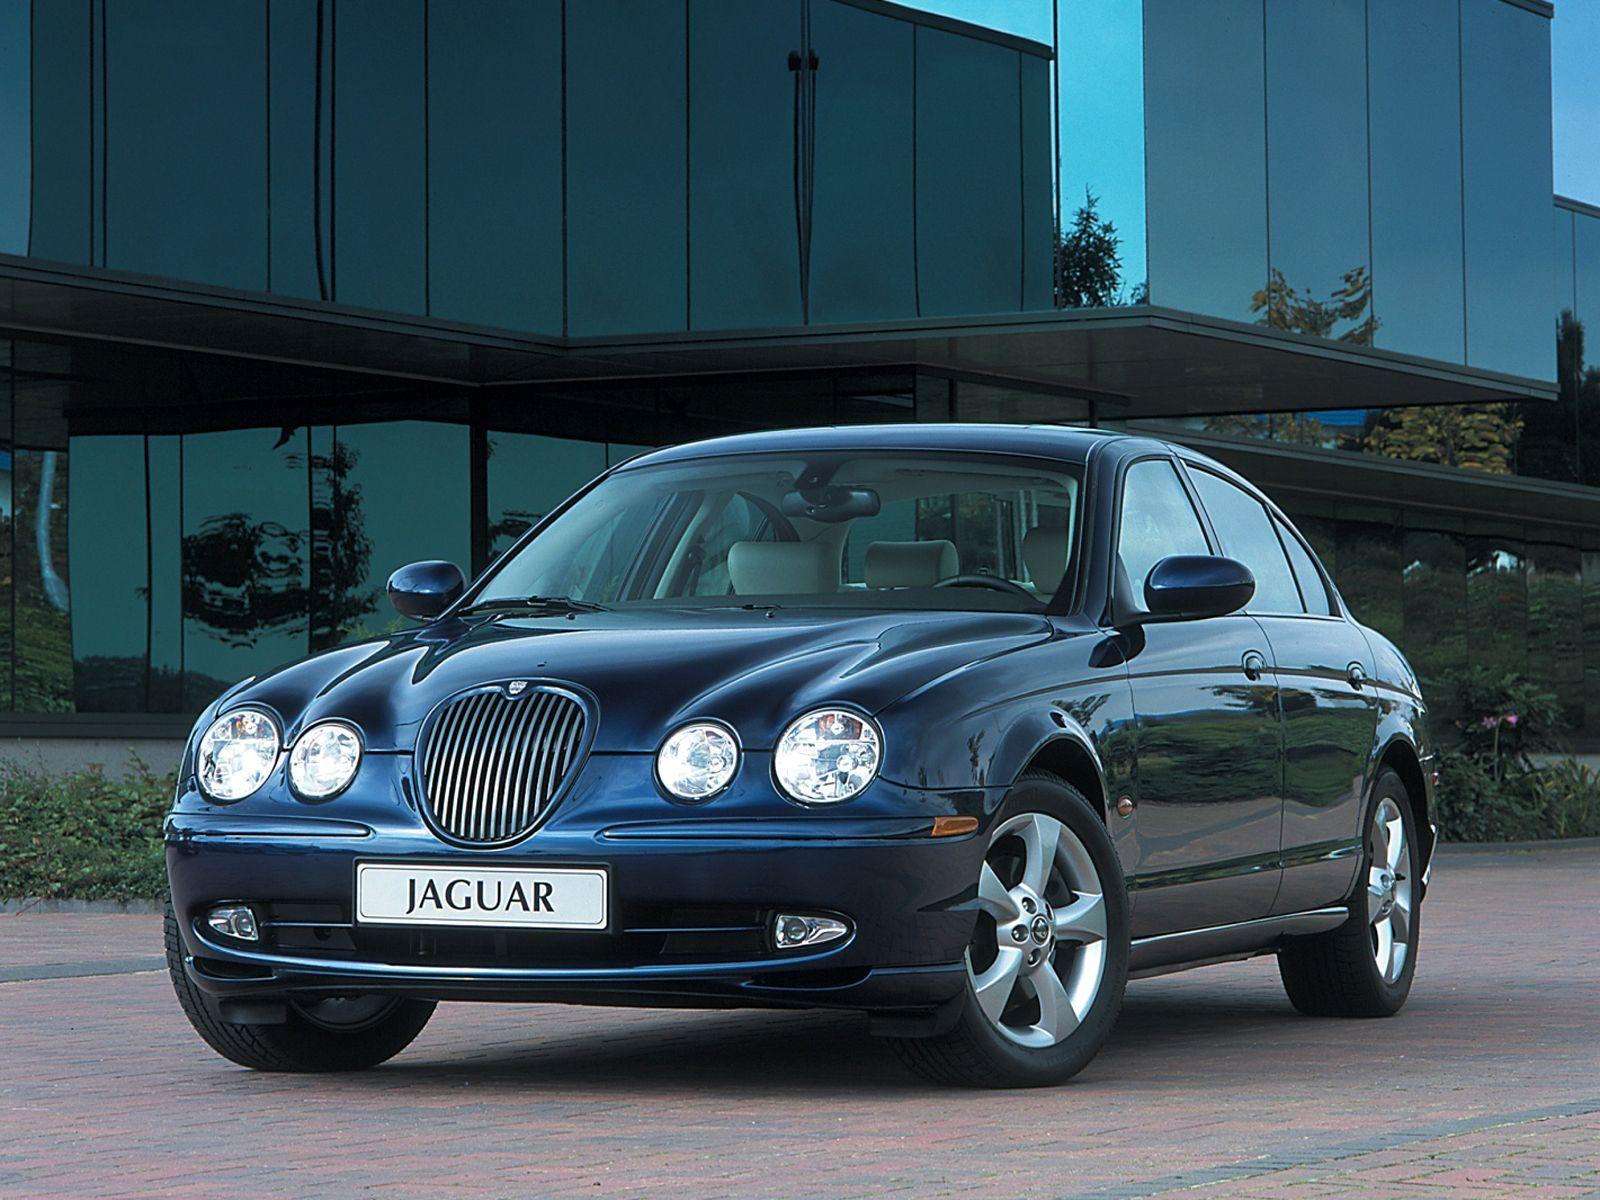 2003 jaguar s type exterior pictures cargurus. Black Bedroom Furniture Sets. Home Design Ideas